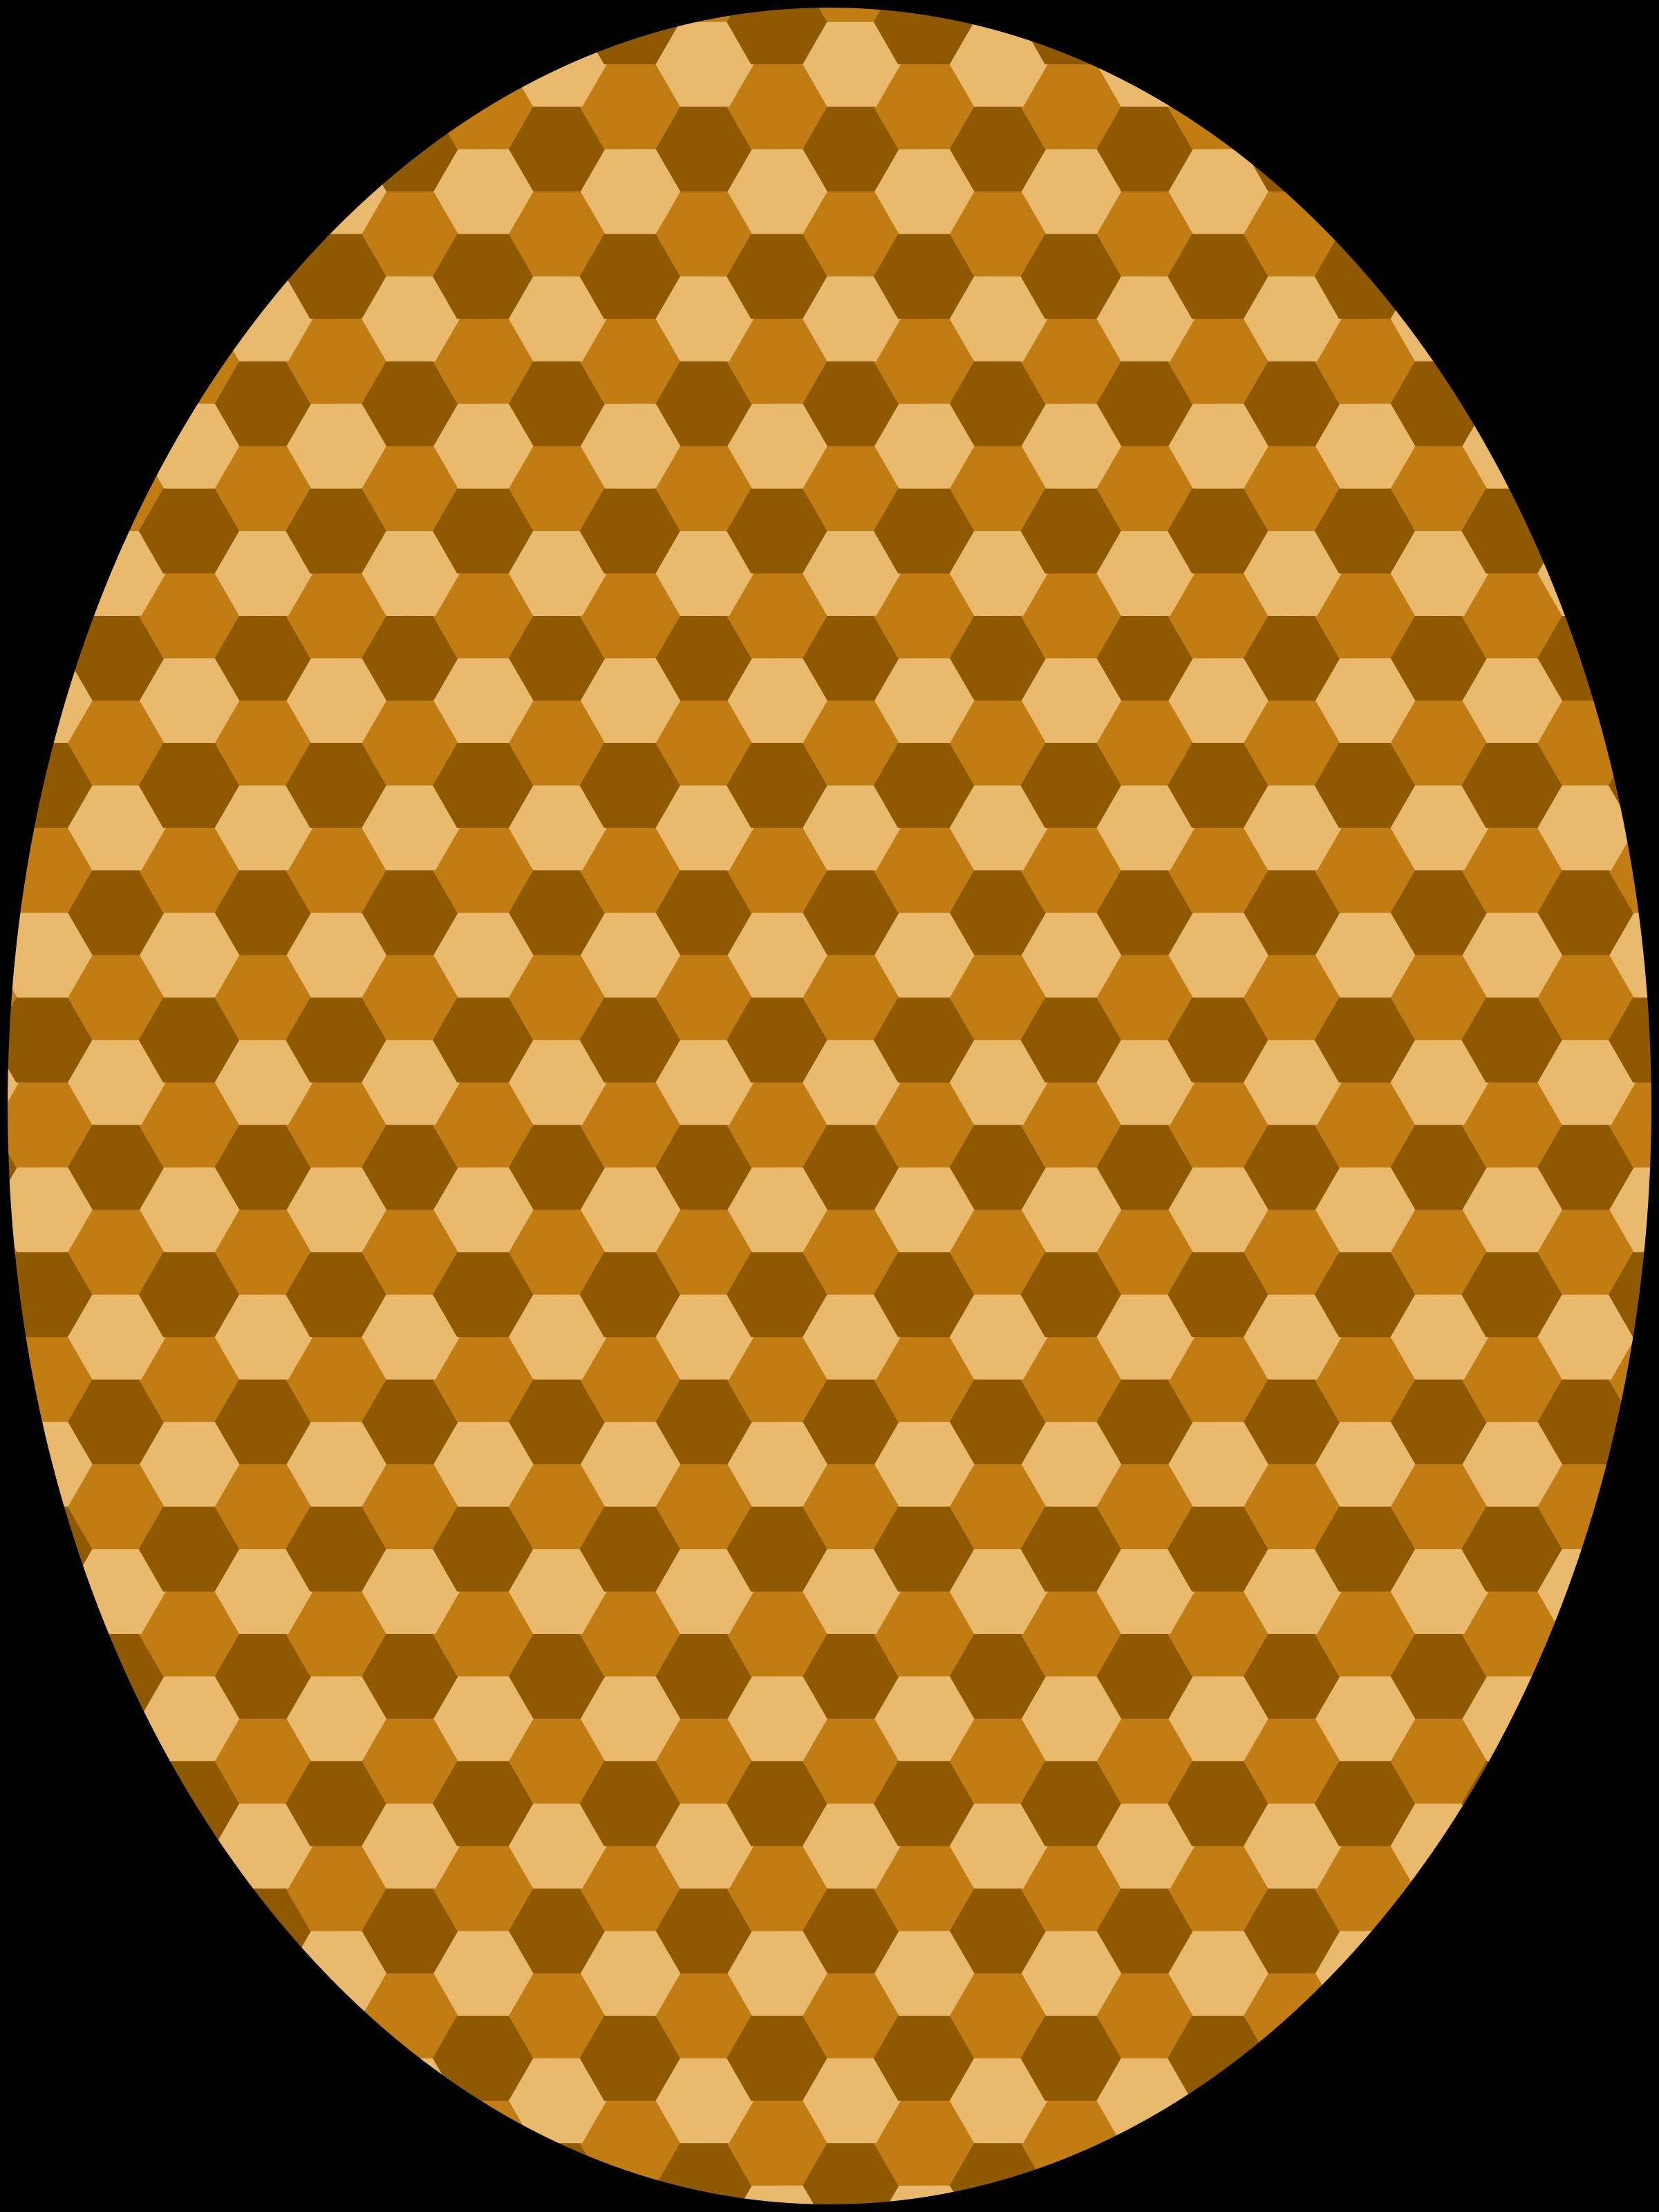 Pattern beige big image. Honeycomb clipart clip art